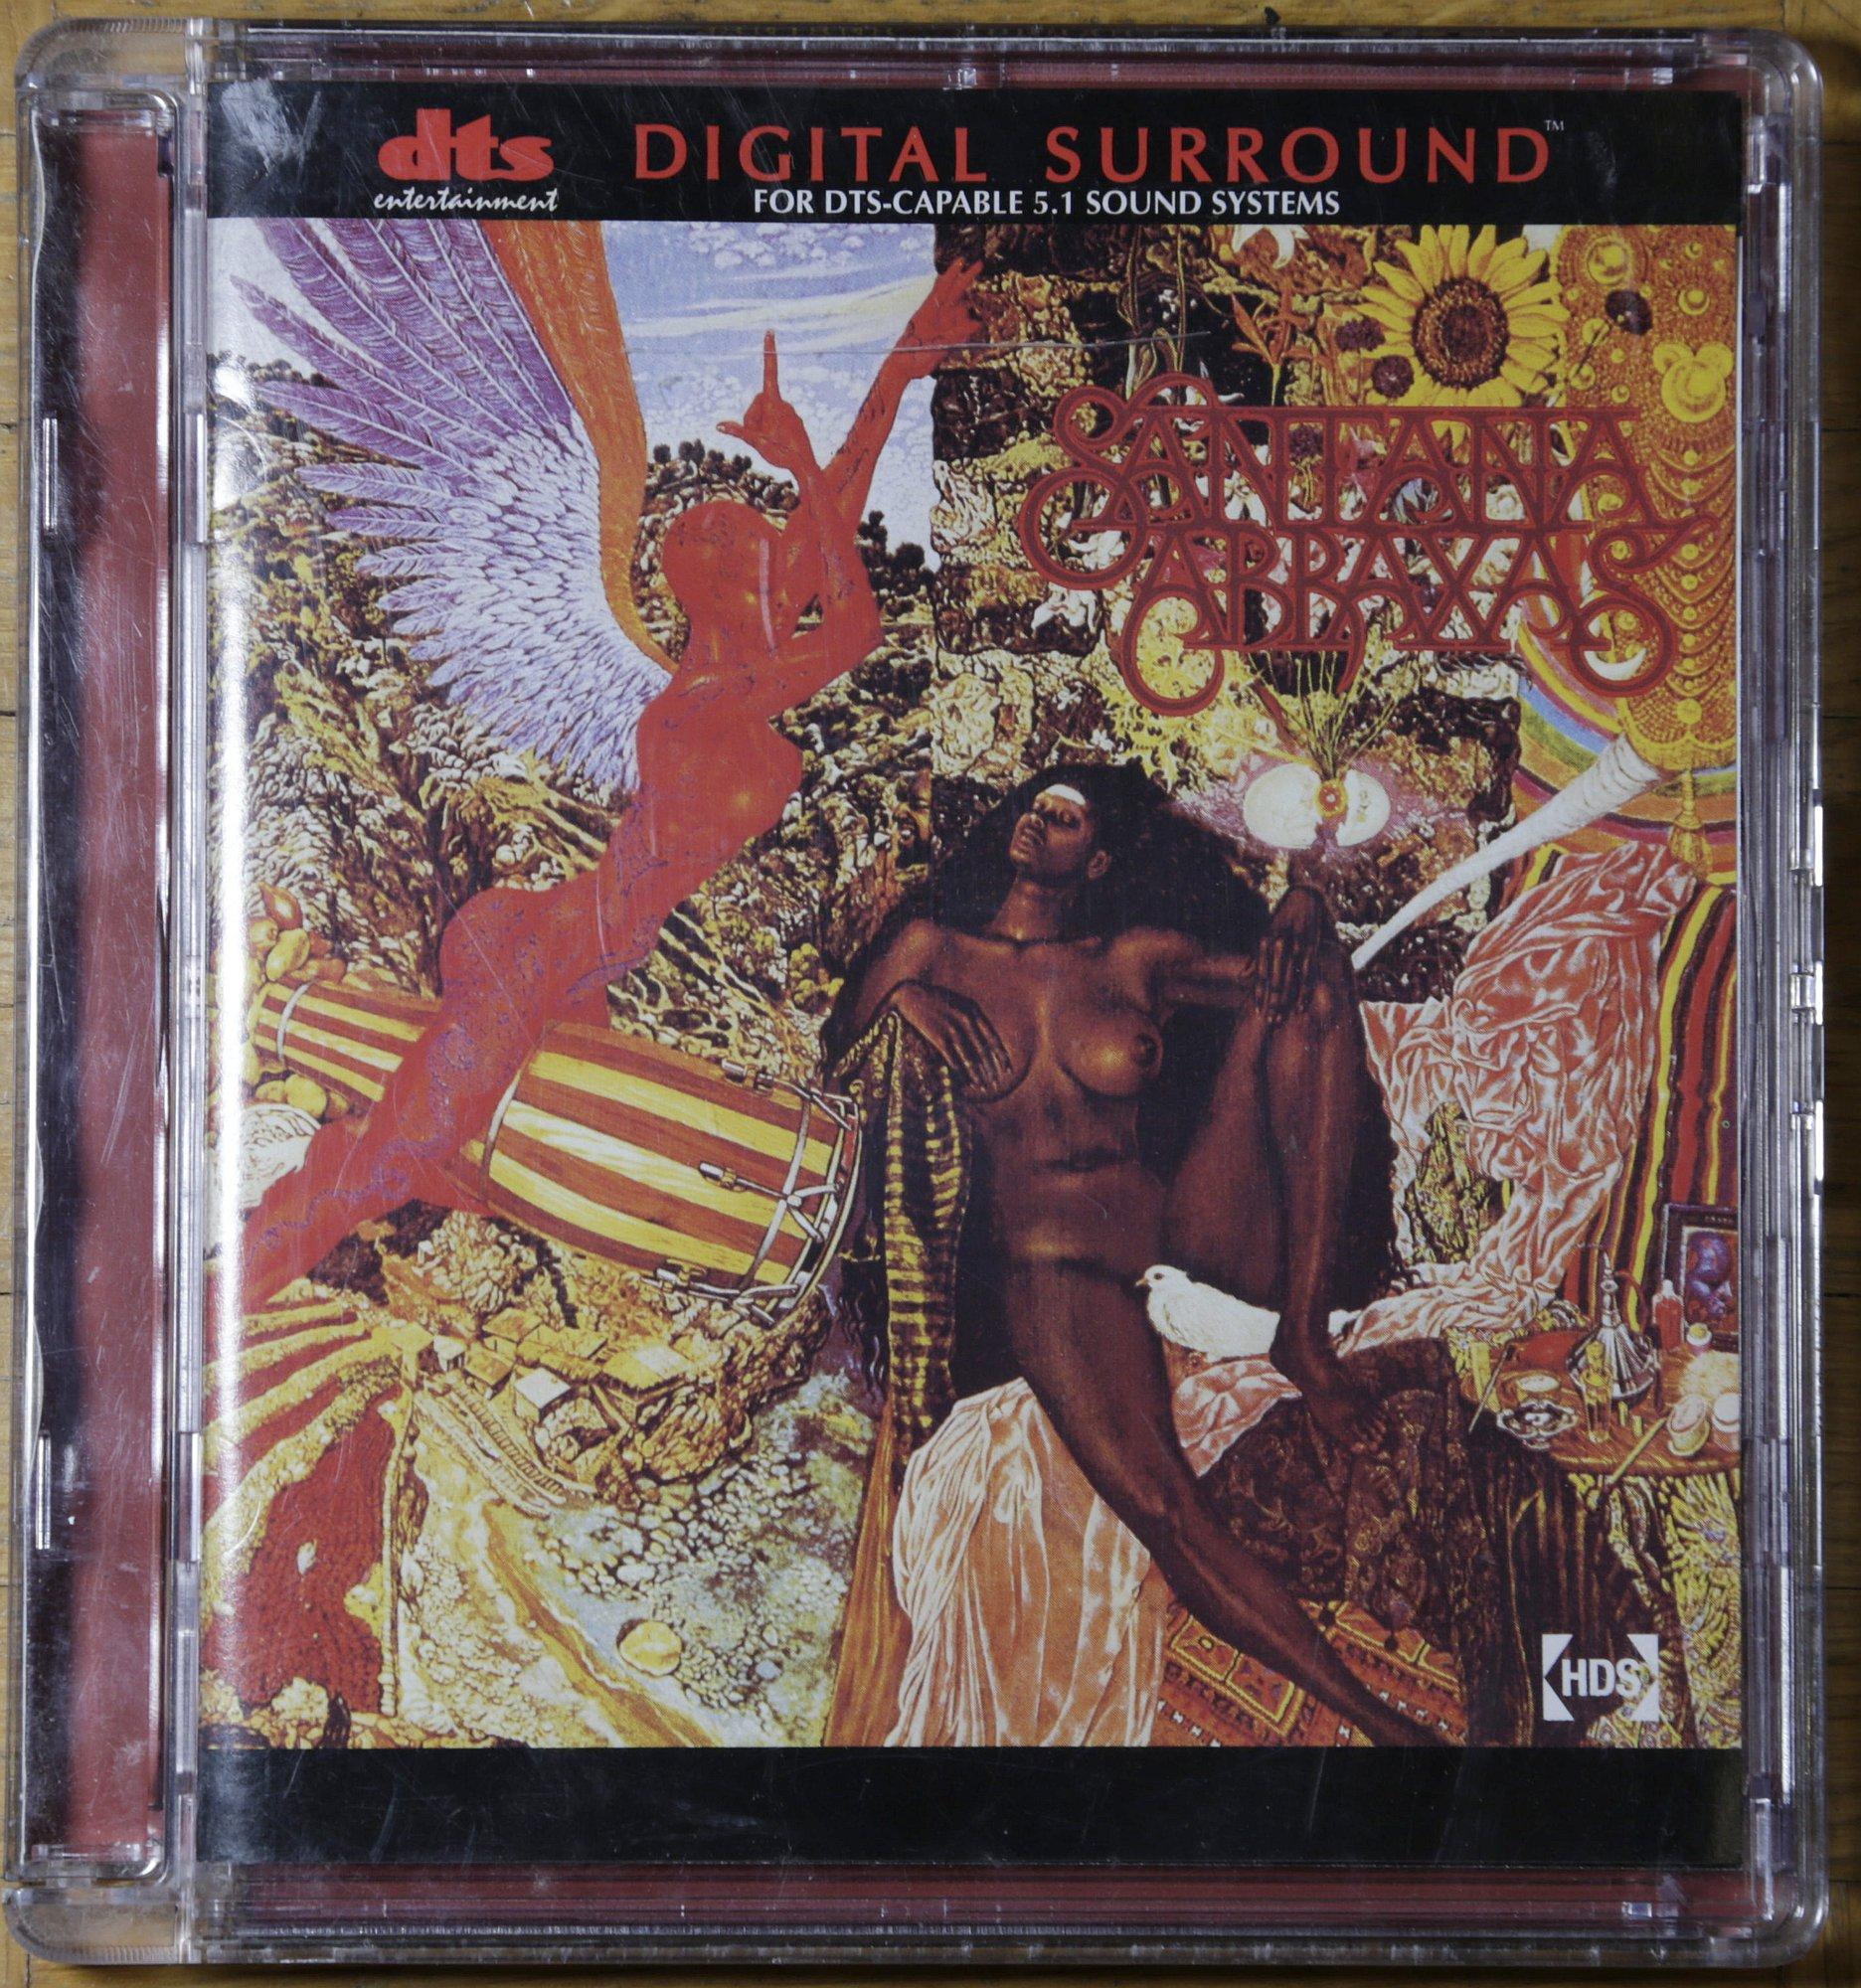 Santana Abraxas DTS CD Surround Sound Review